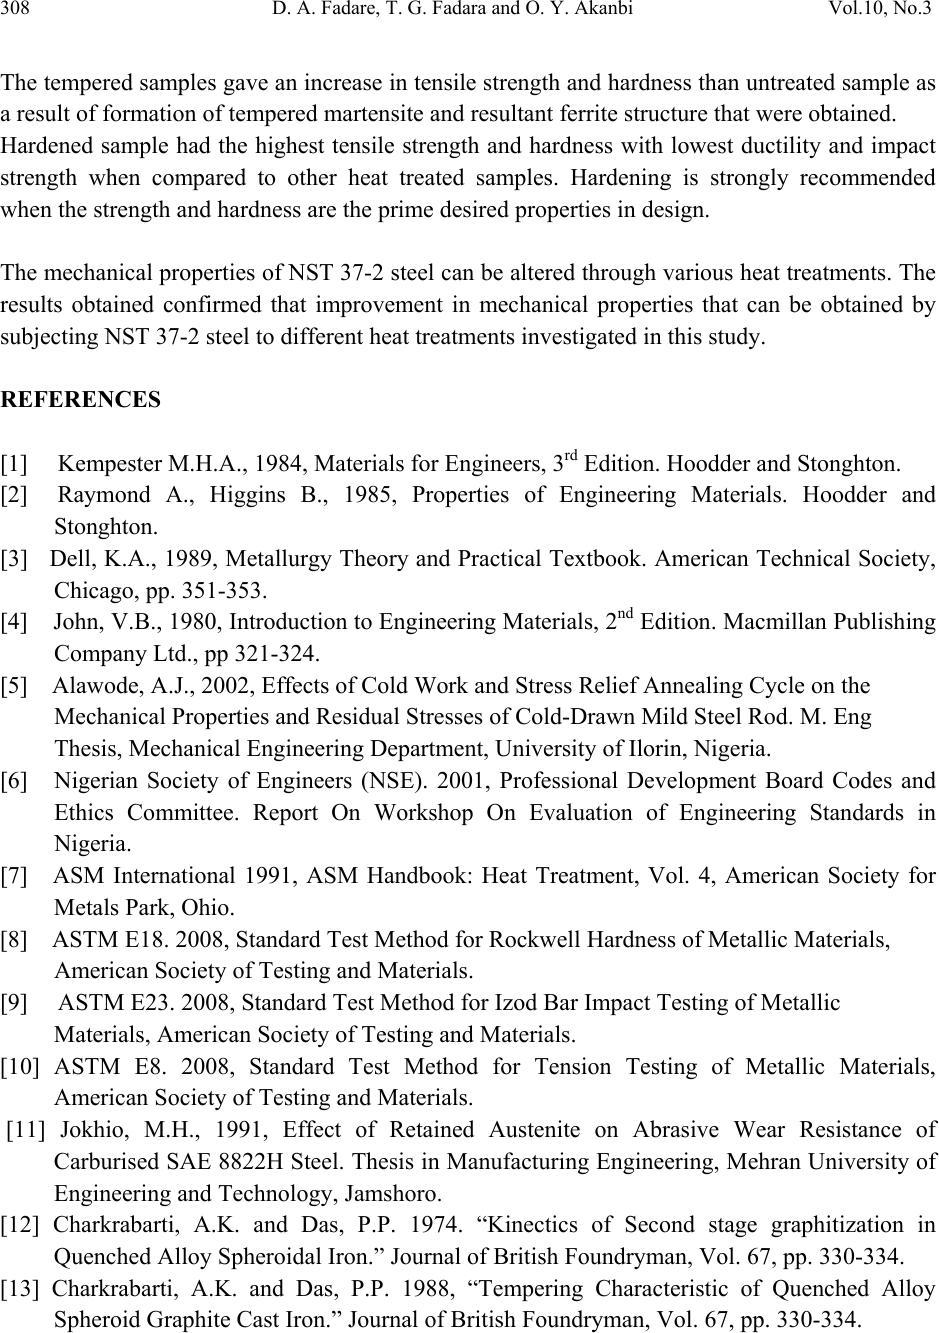 Workforce Management Cover Letter   Kleo.beachfix.co